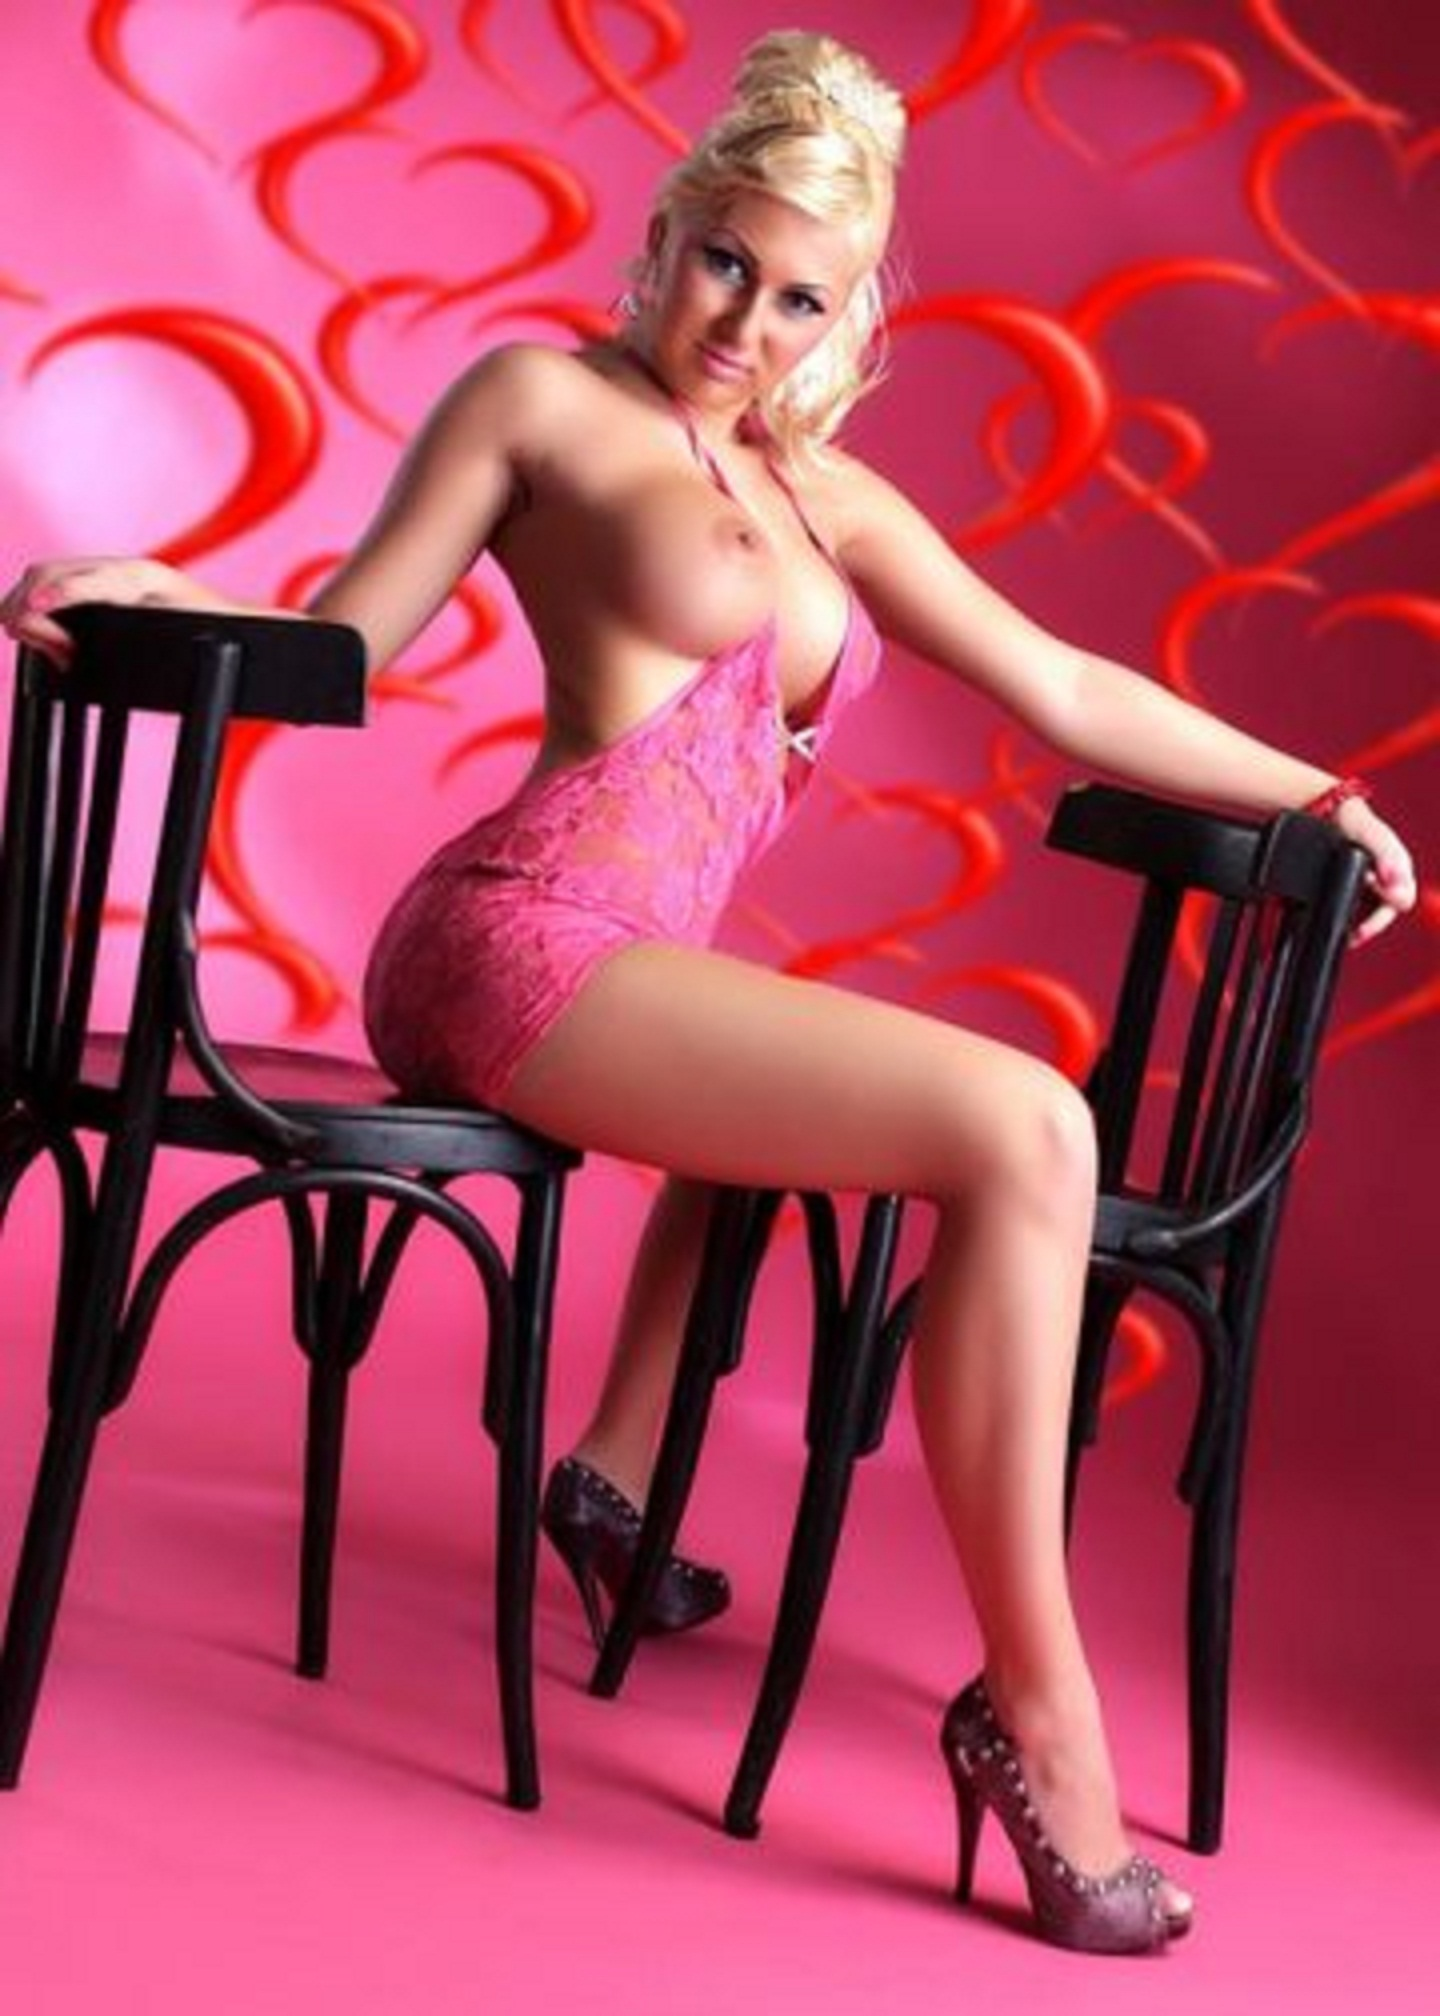 Aida Sensual Top Escort Babe in Amsterdam! - Afbeelding2